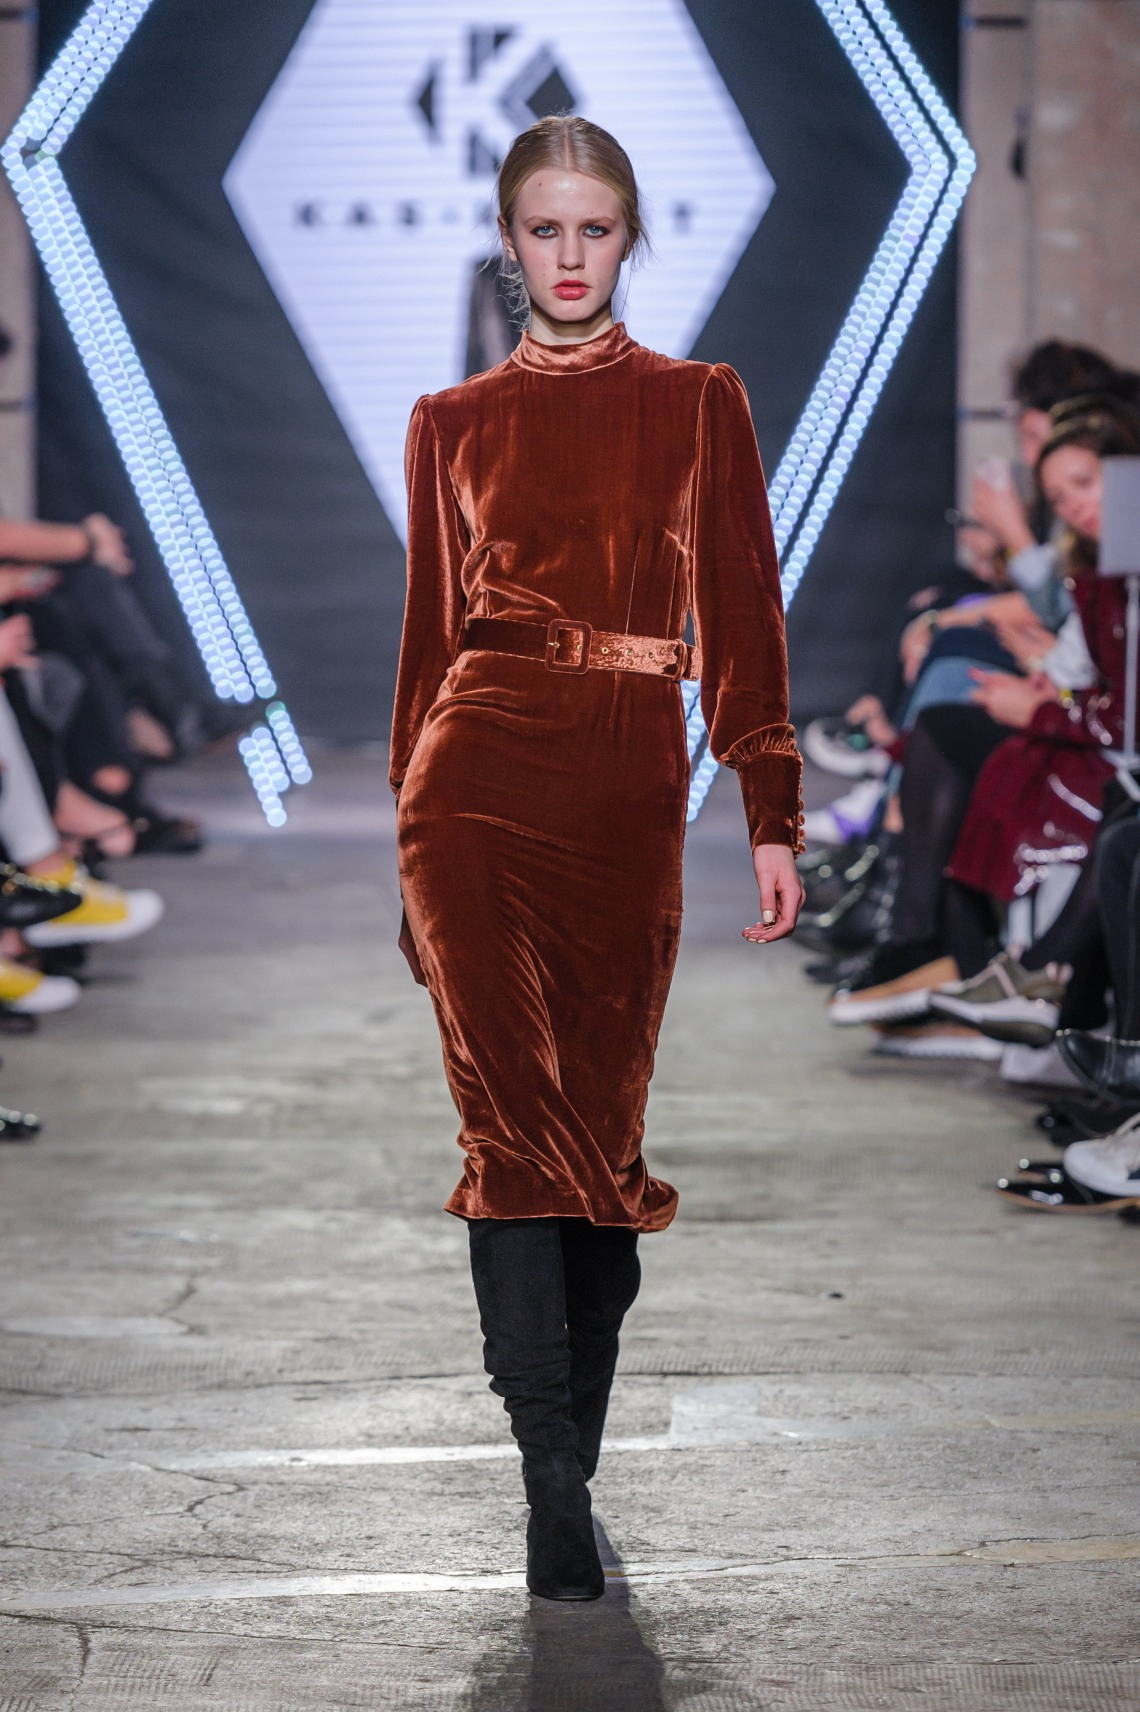 7ktw-101118_15-kaskryst_highres_fotfilipokopny-fashionimages